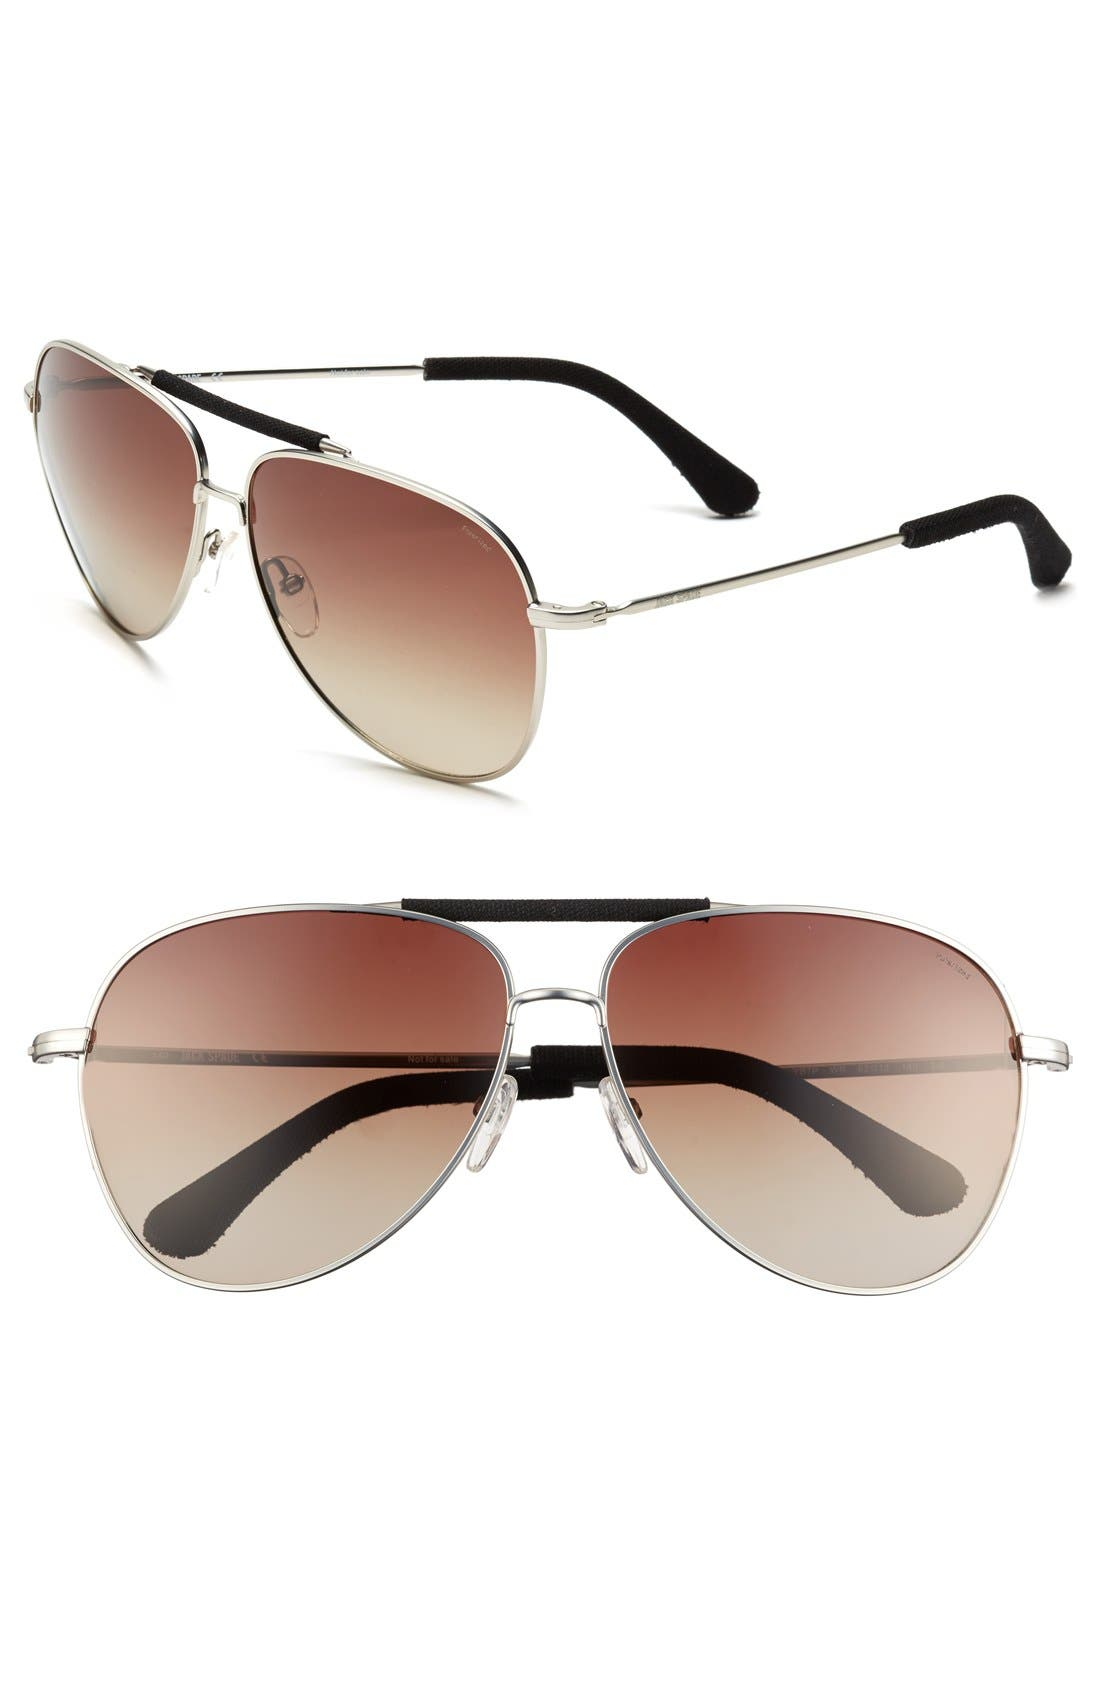 Main Image - Jack Spade 'Hopkins' 62mm Polarized Sunglasses